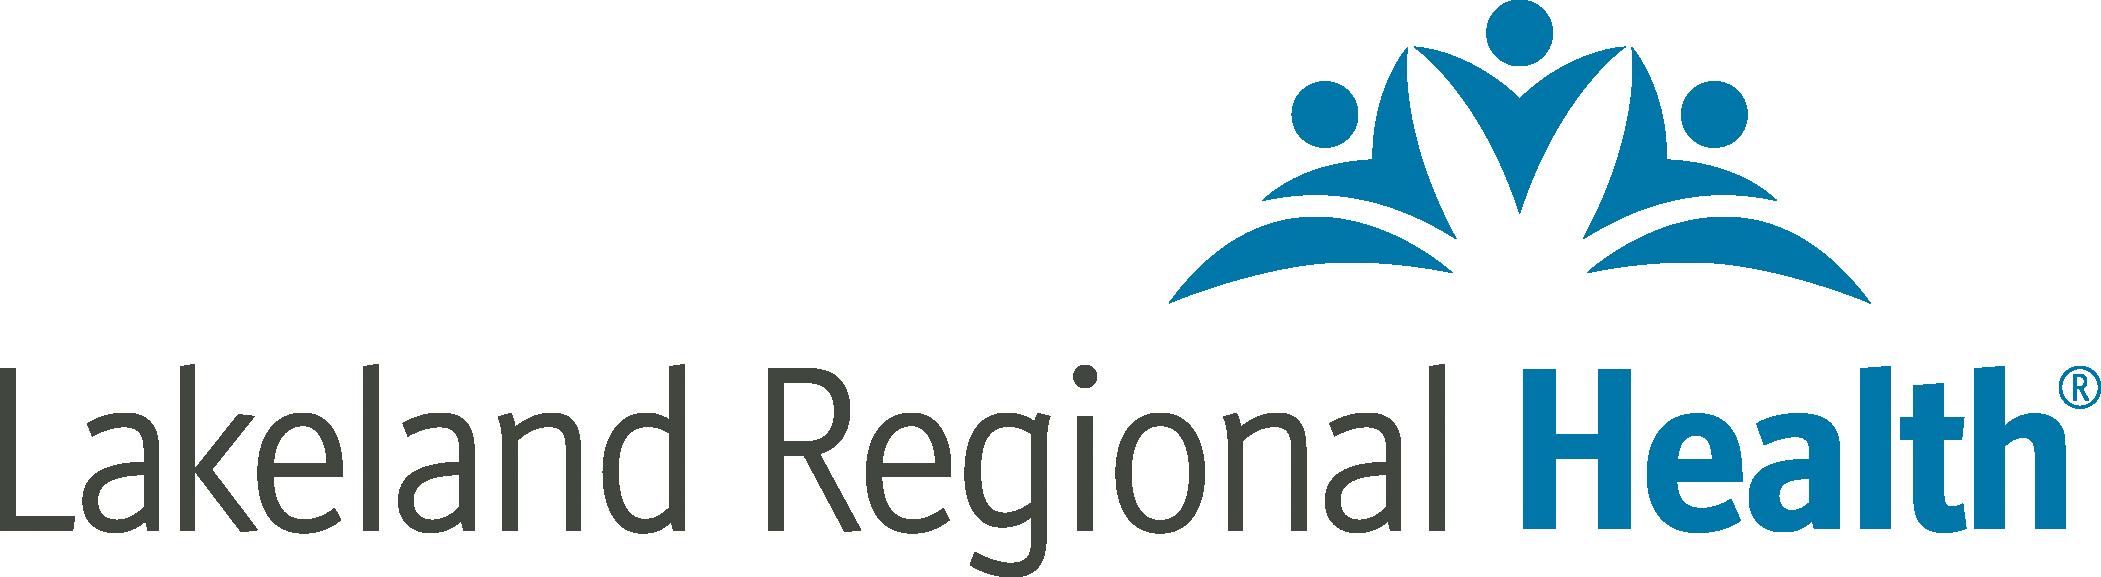 Lakeland Regional Health - New logo 2015